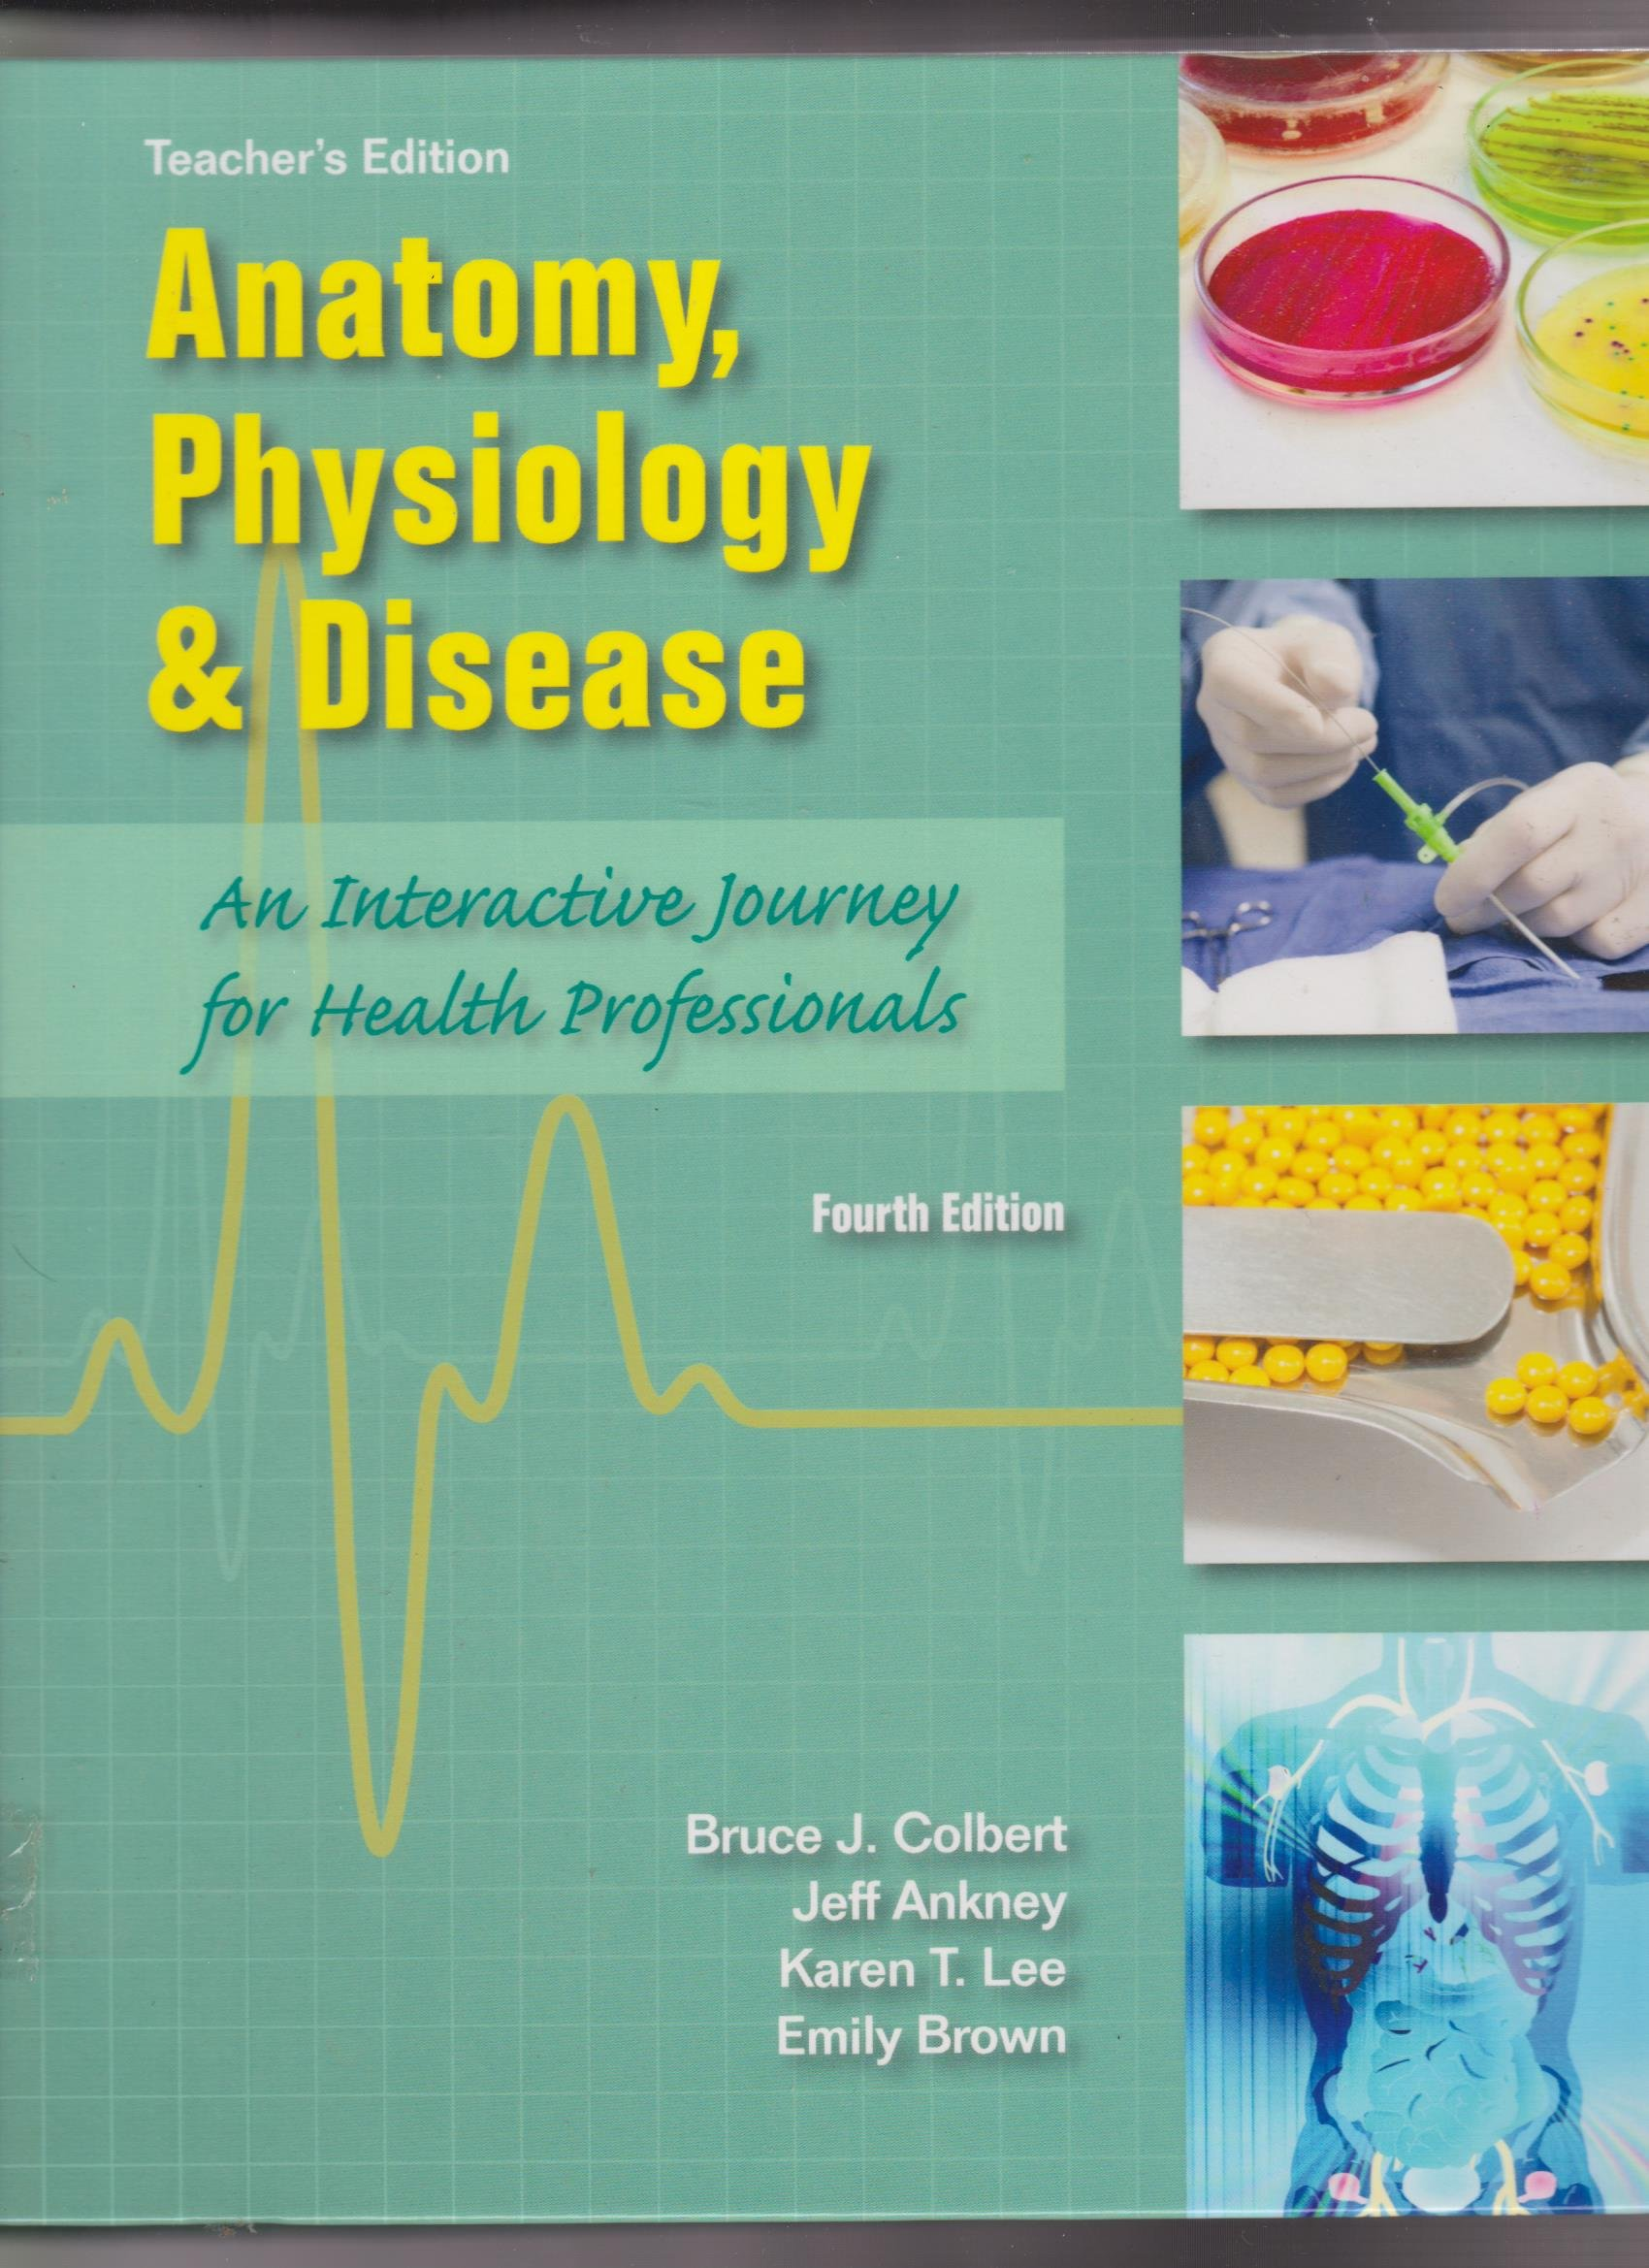 ANATOMY, PHYSIOLOGY AND DISEASE, 4TH EDITION TEACHERS EDITION: BRUCE ...